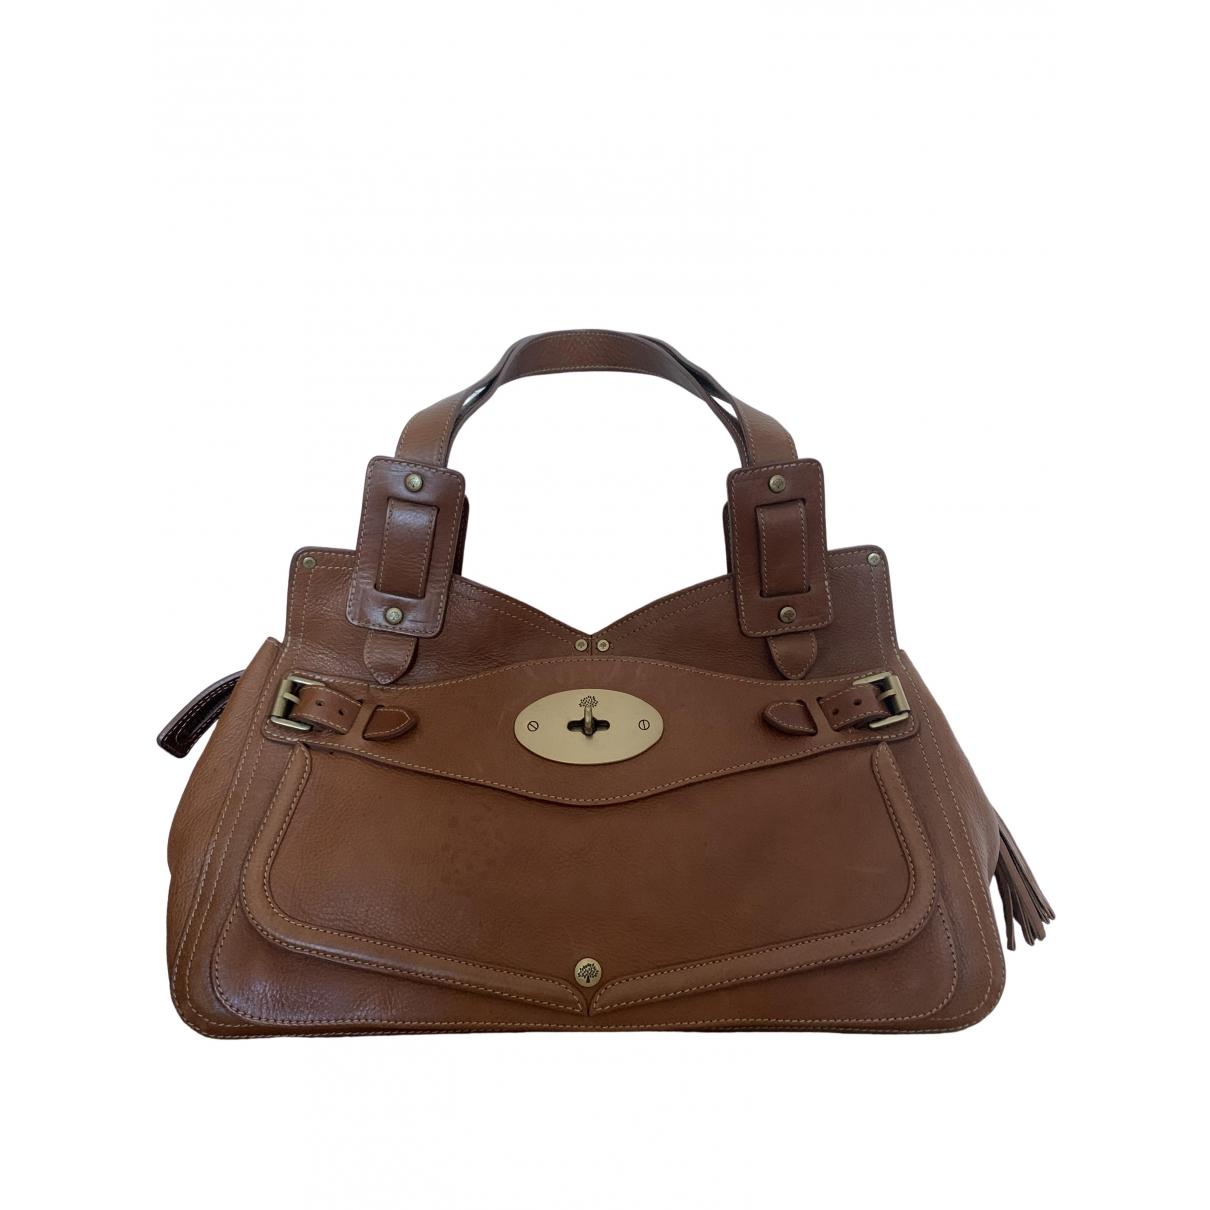 Mulberry \N Camel Leather handbag for Women \N